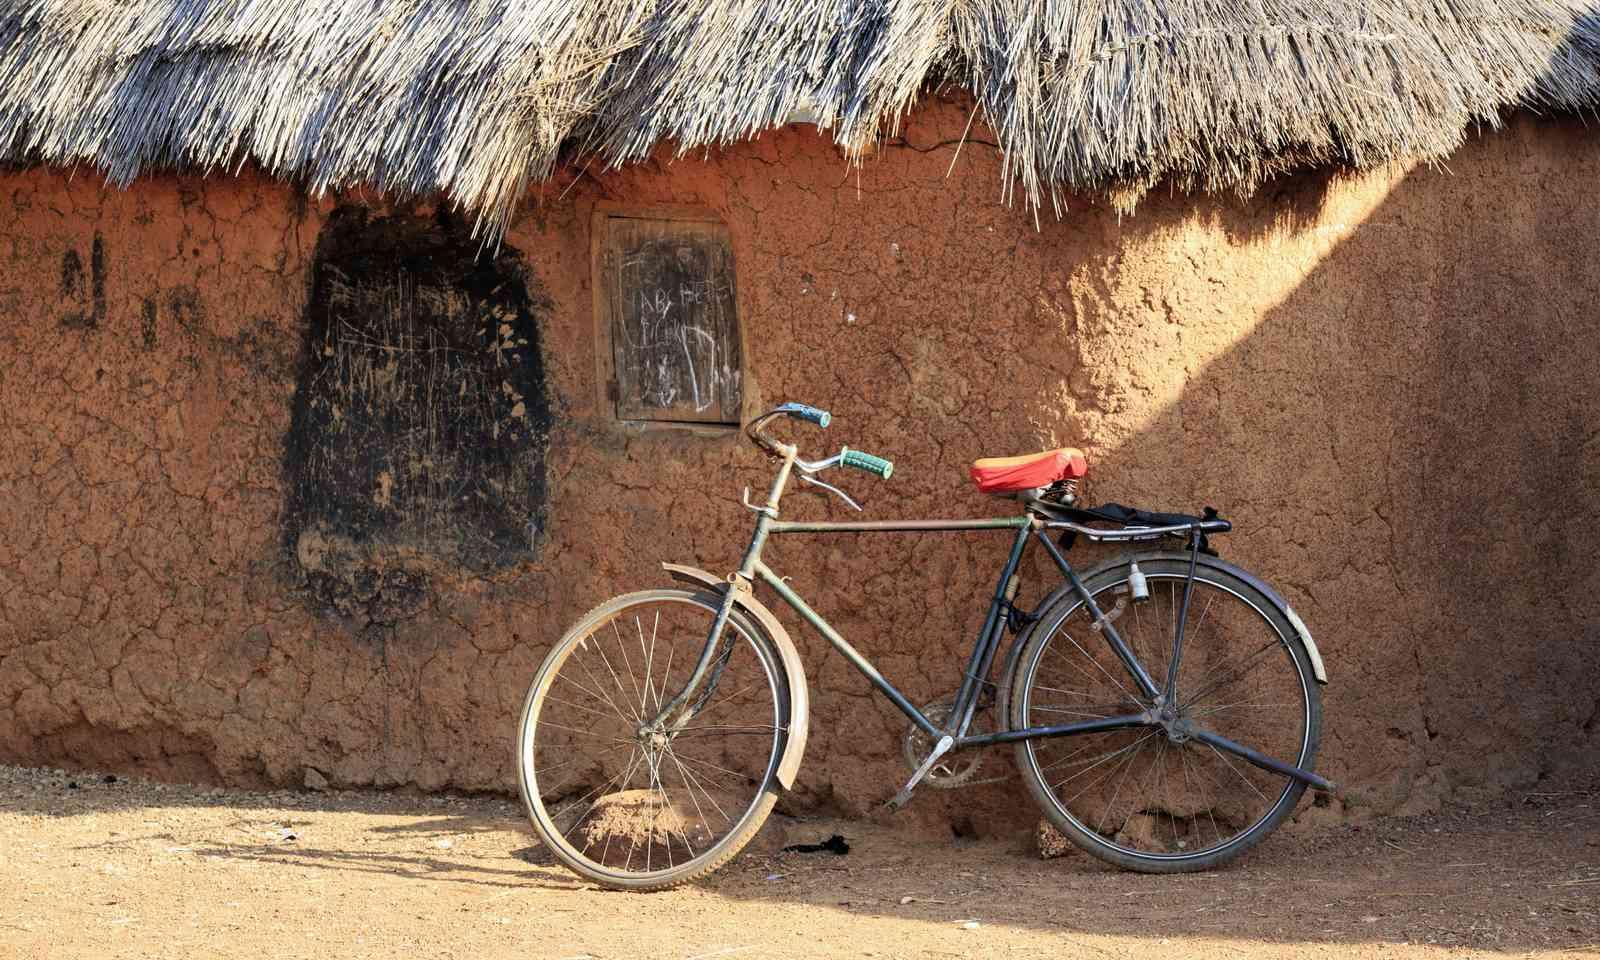 Bicycle leaning against mud hut (Dreamstime)